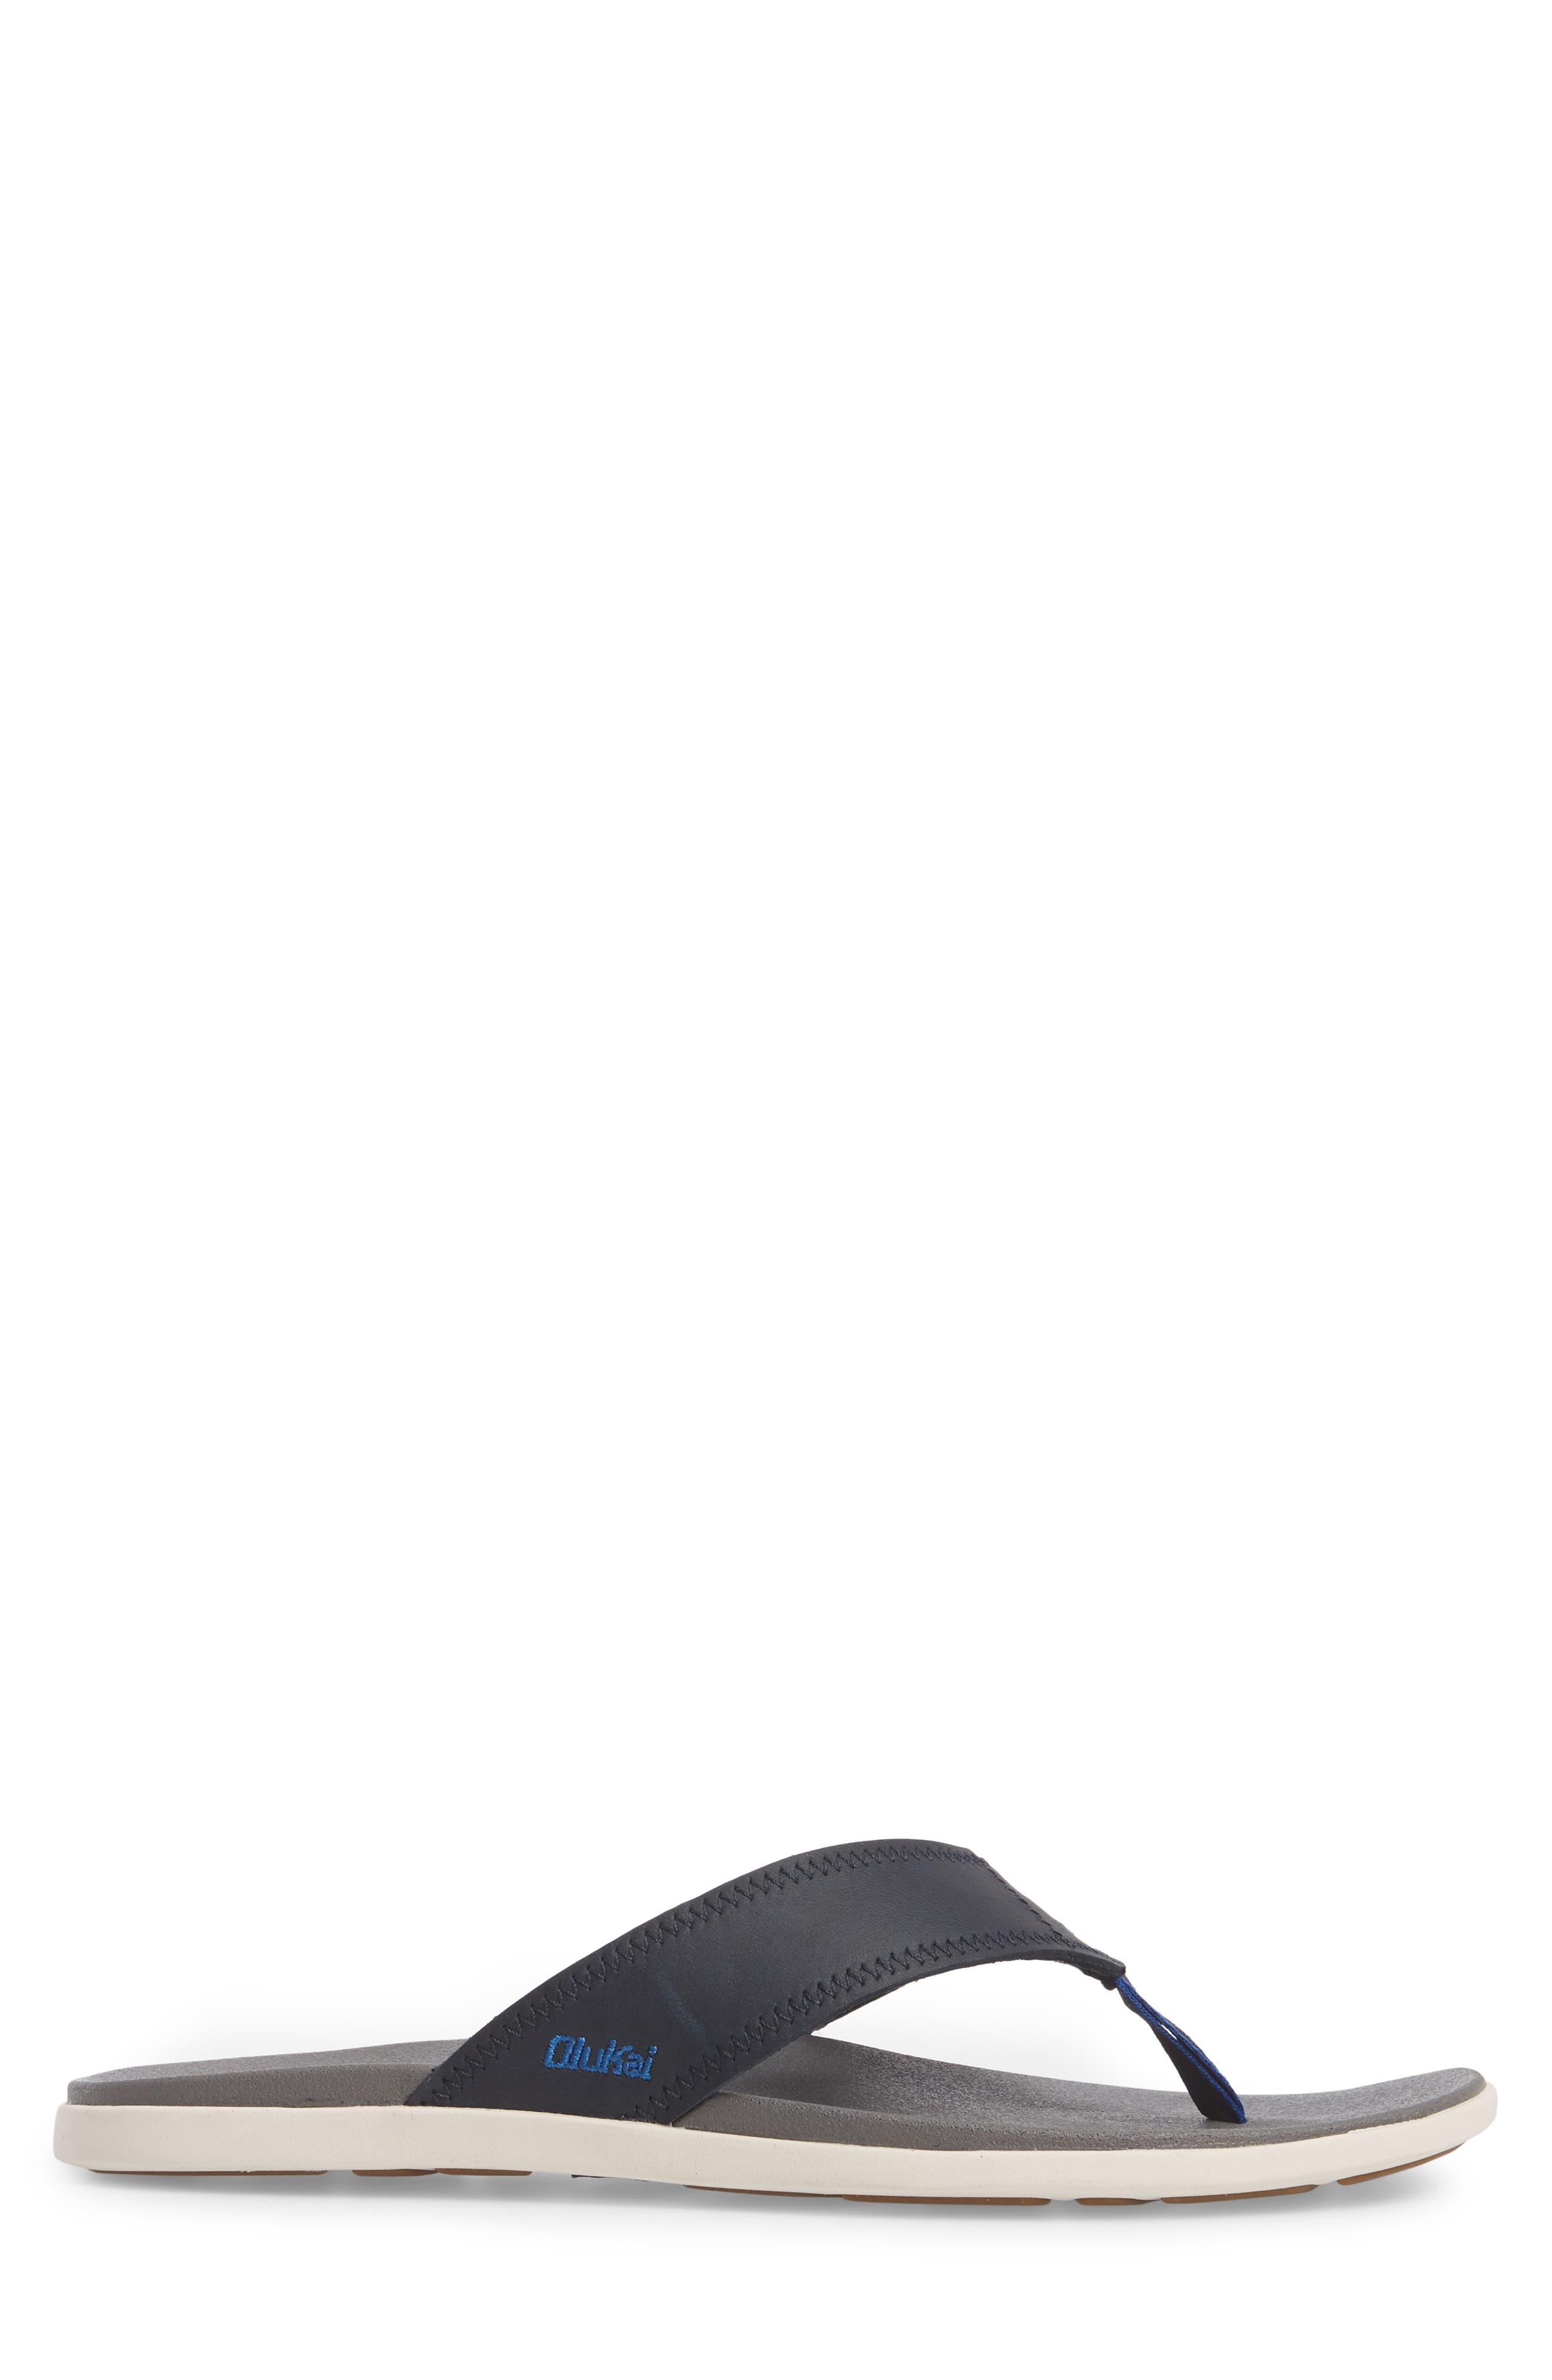 OLUKAI,                             Kinona Flip Flop,                             Alternate thumbnail 3, color,                             420